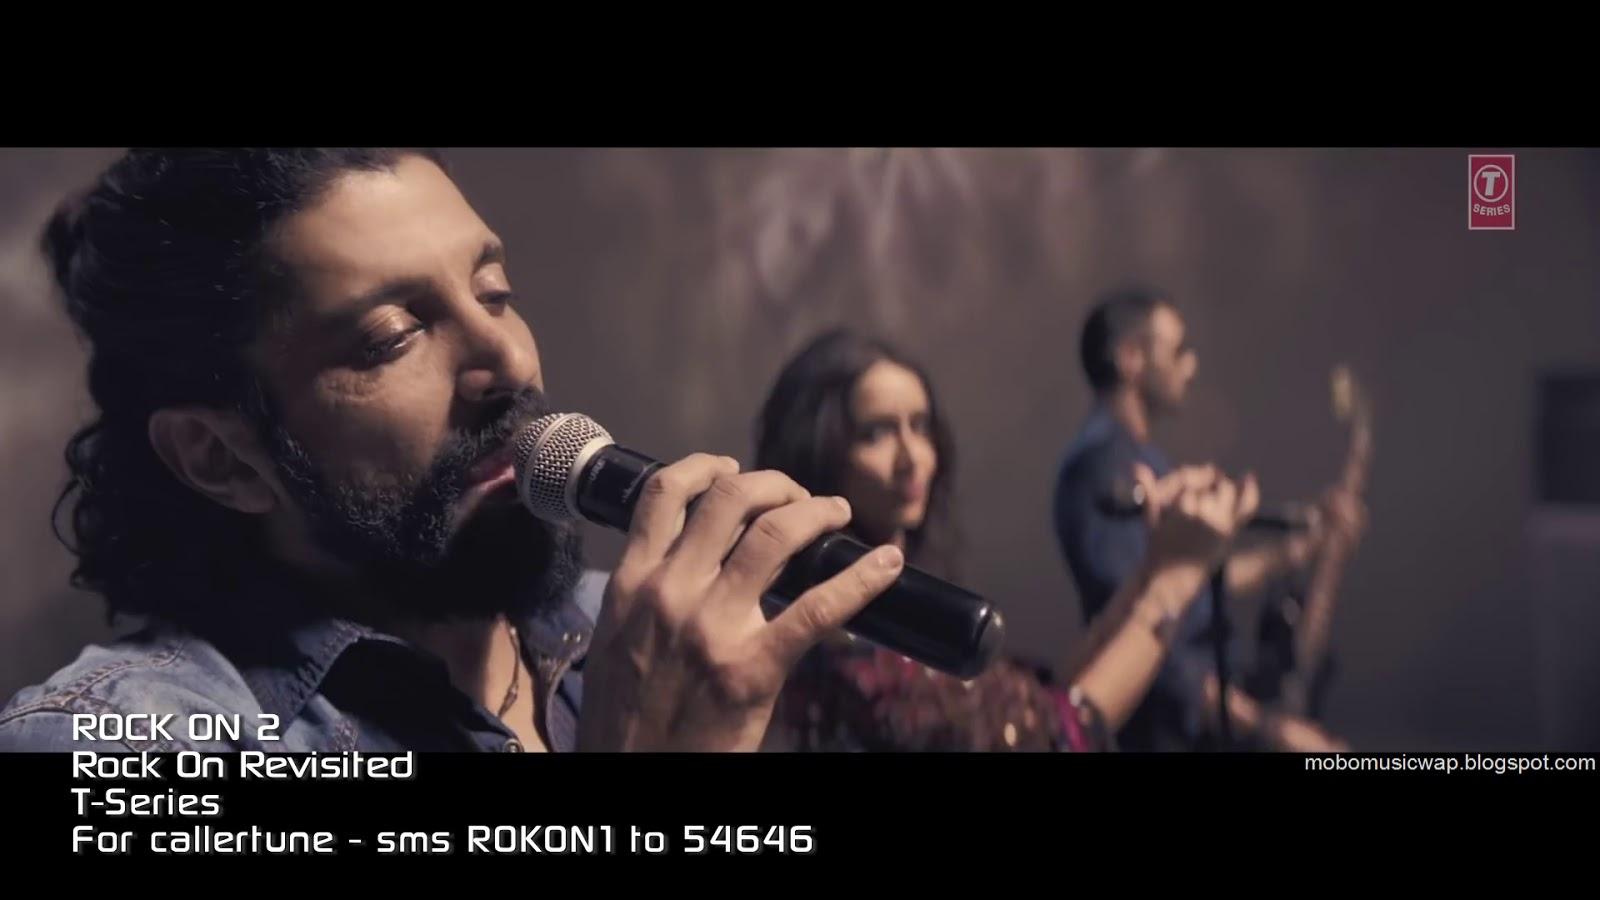 Rock the shaadi mp3 songs free download gopfinance.